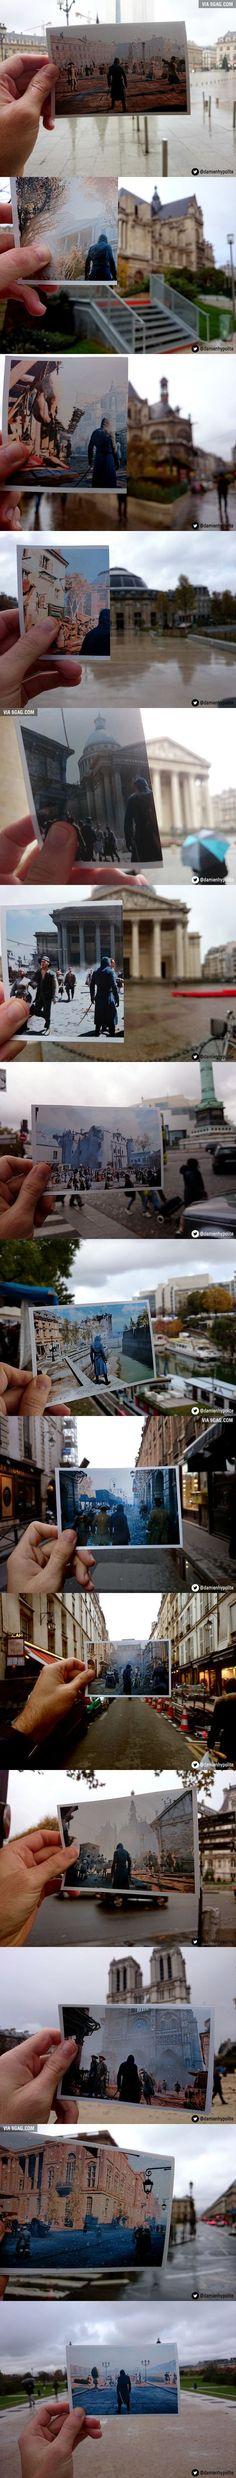 14 Assassin's Creed Unity In-Game Vs Modern Paris Comparison Pics: